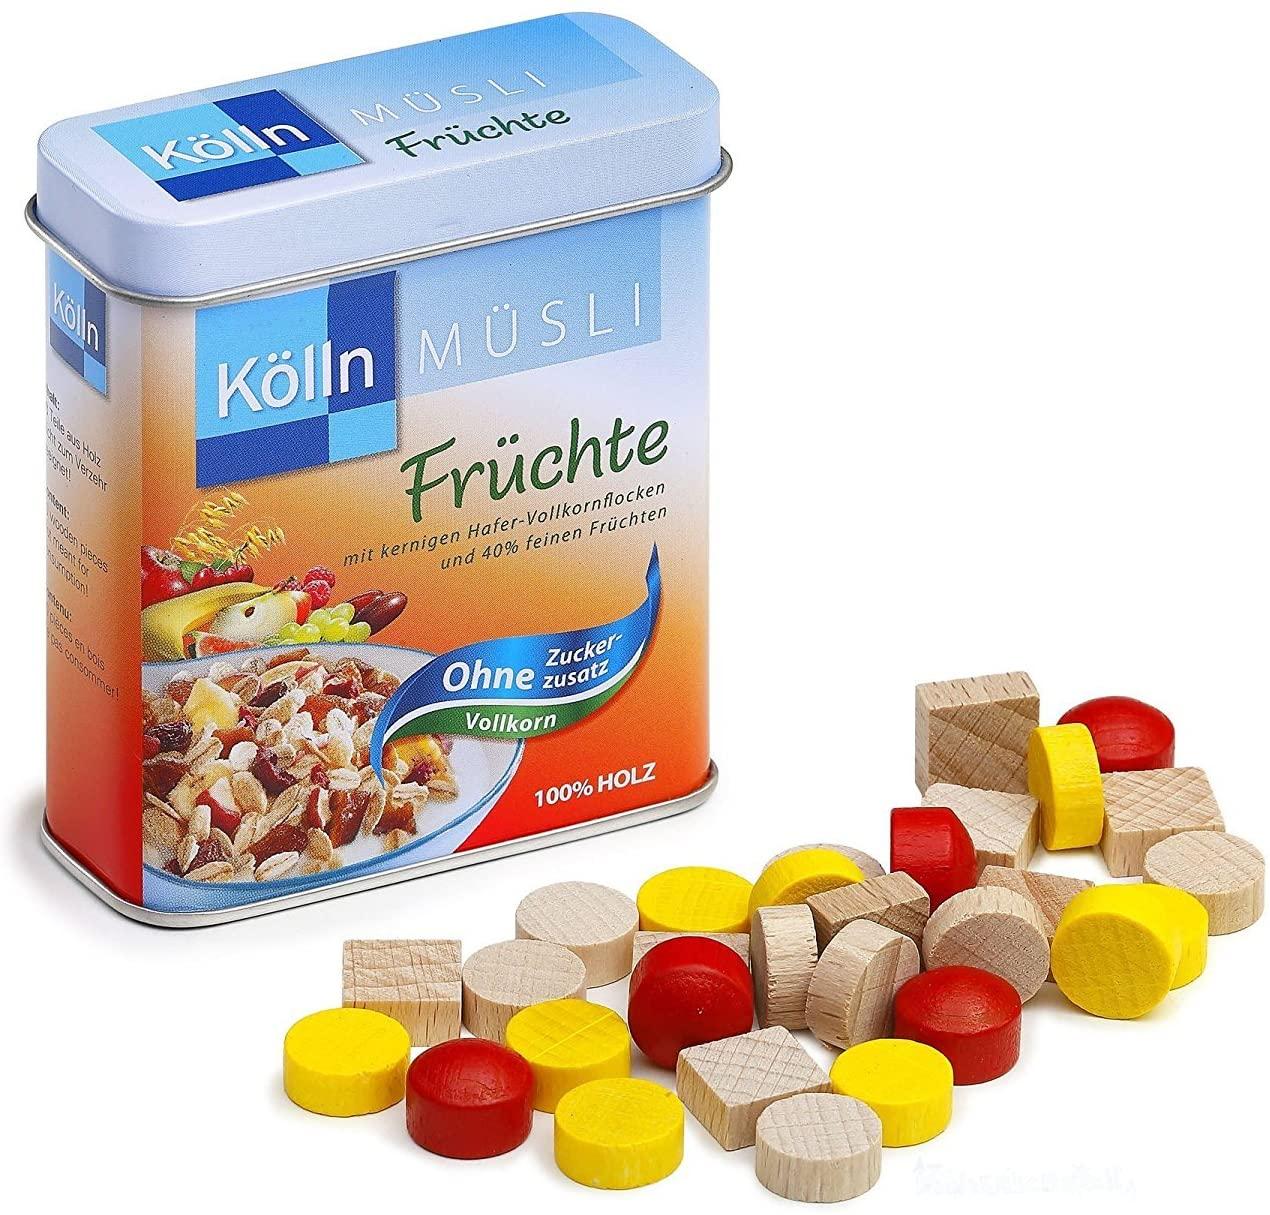 Erzi Wooden Grocery Shop Kölln Cereals in a Tin, 7.1 x 3.1 x 8.1 cm